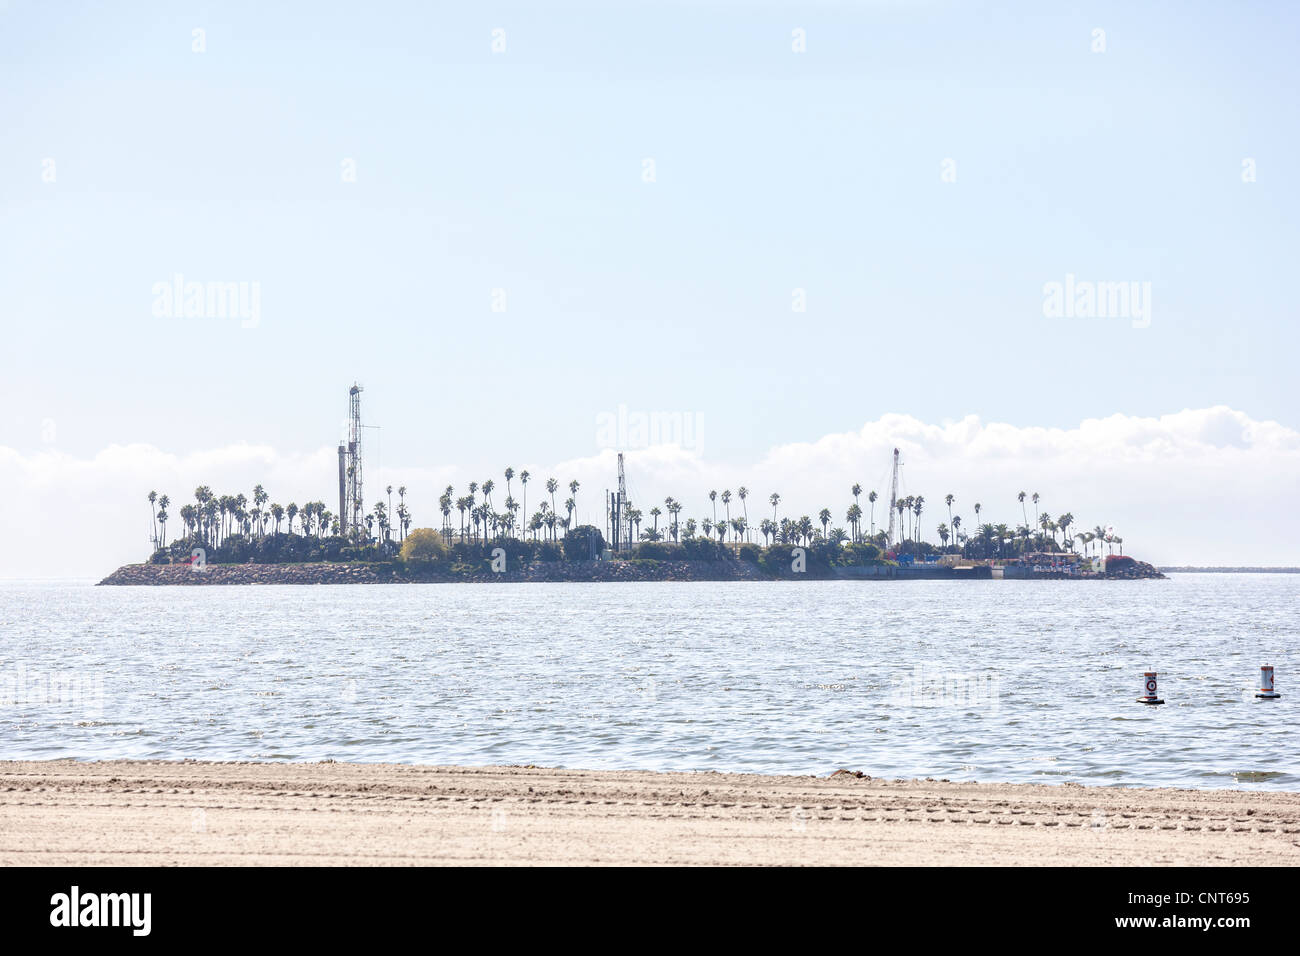 Long Beach California THUMS Island Chaffee, offshore oil